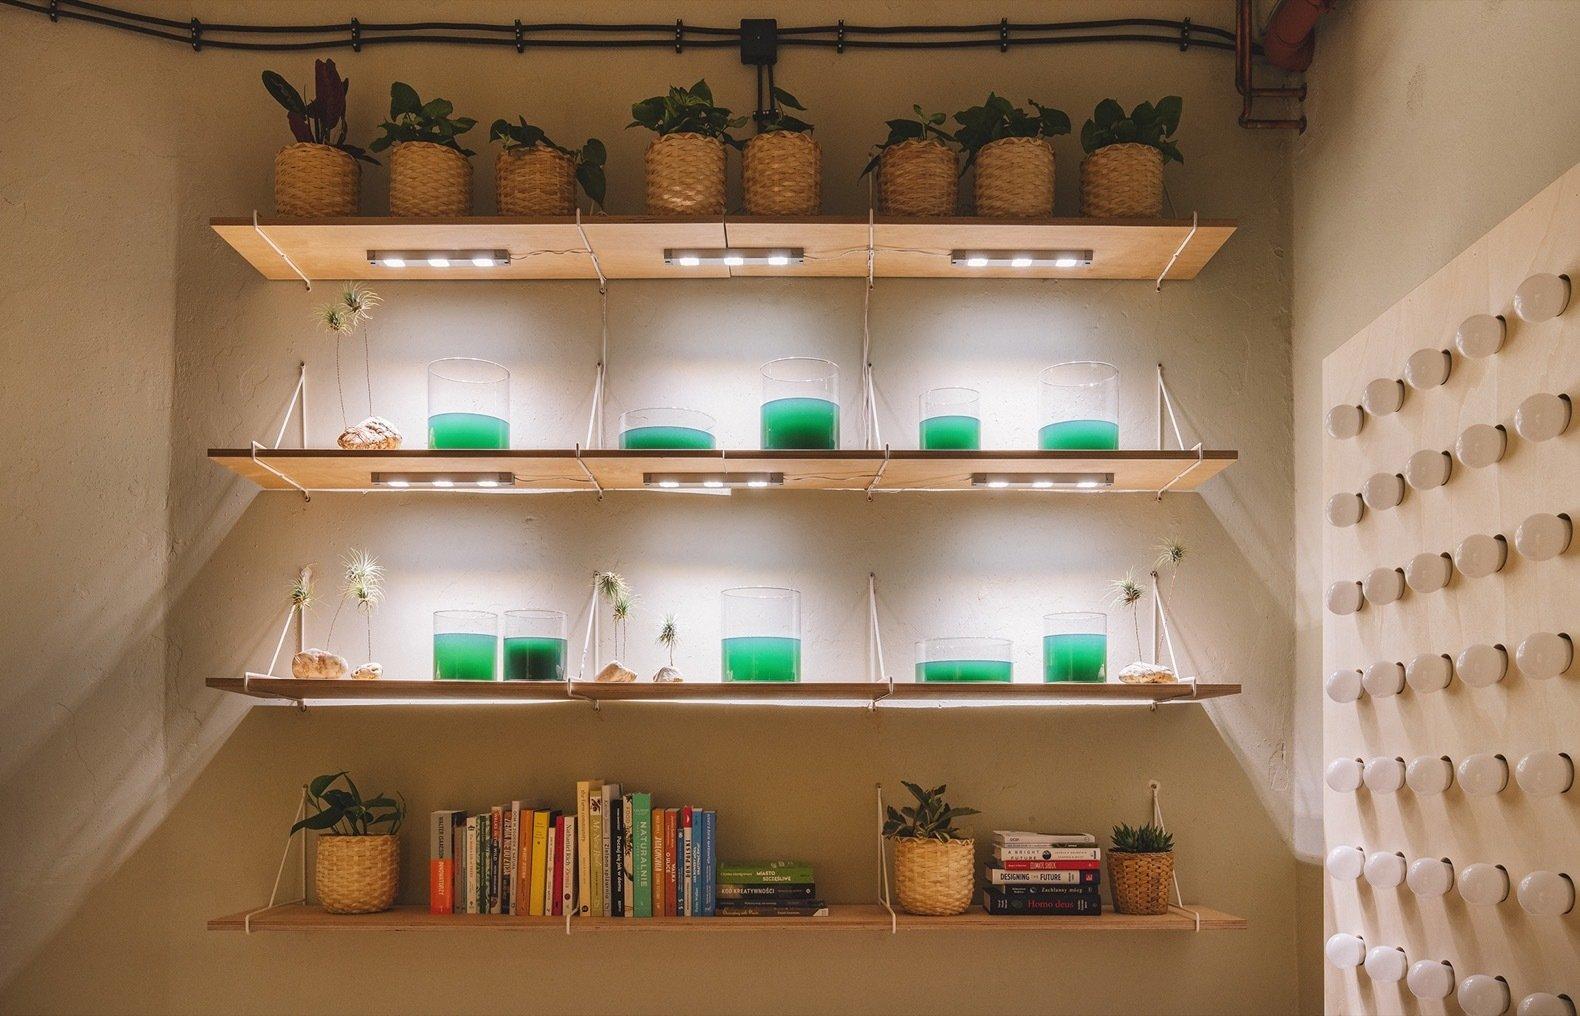 IKEA Home of Tomorrow spirulina farm